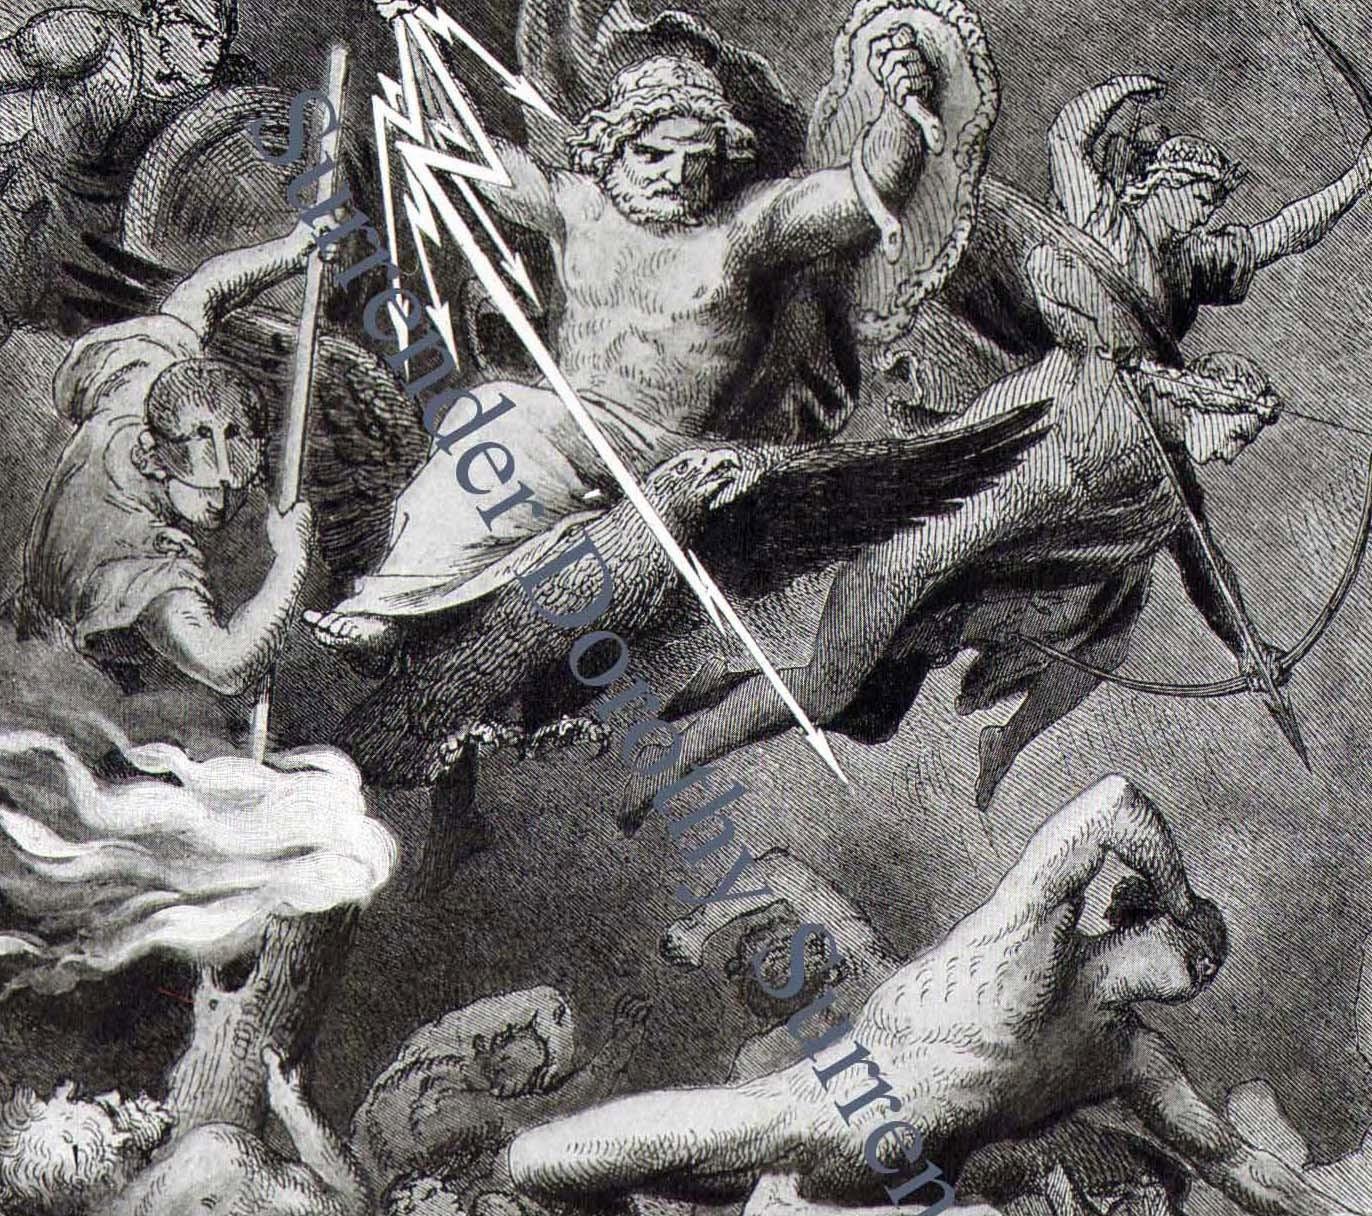 Battle Gods & Giants 1908 Edwardian Engraving Vintage  Battle Gods & G...